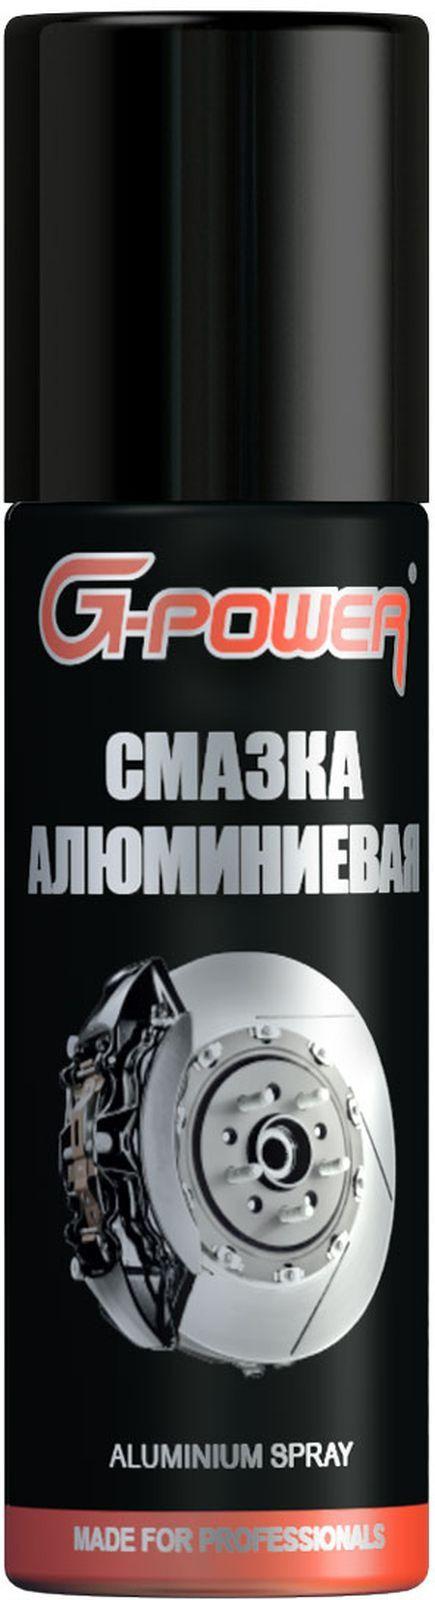 Смазка G-Power, 90 мл